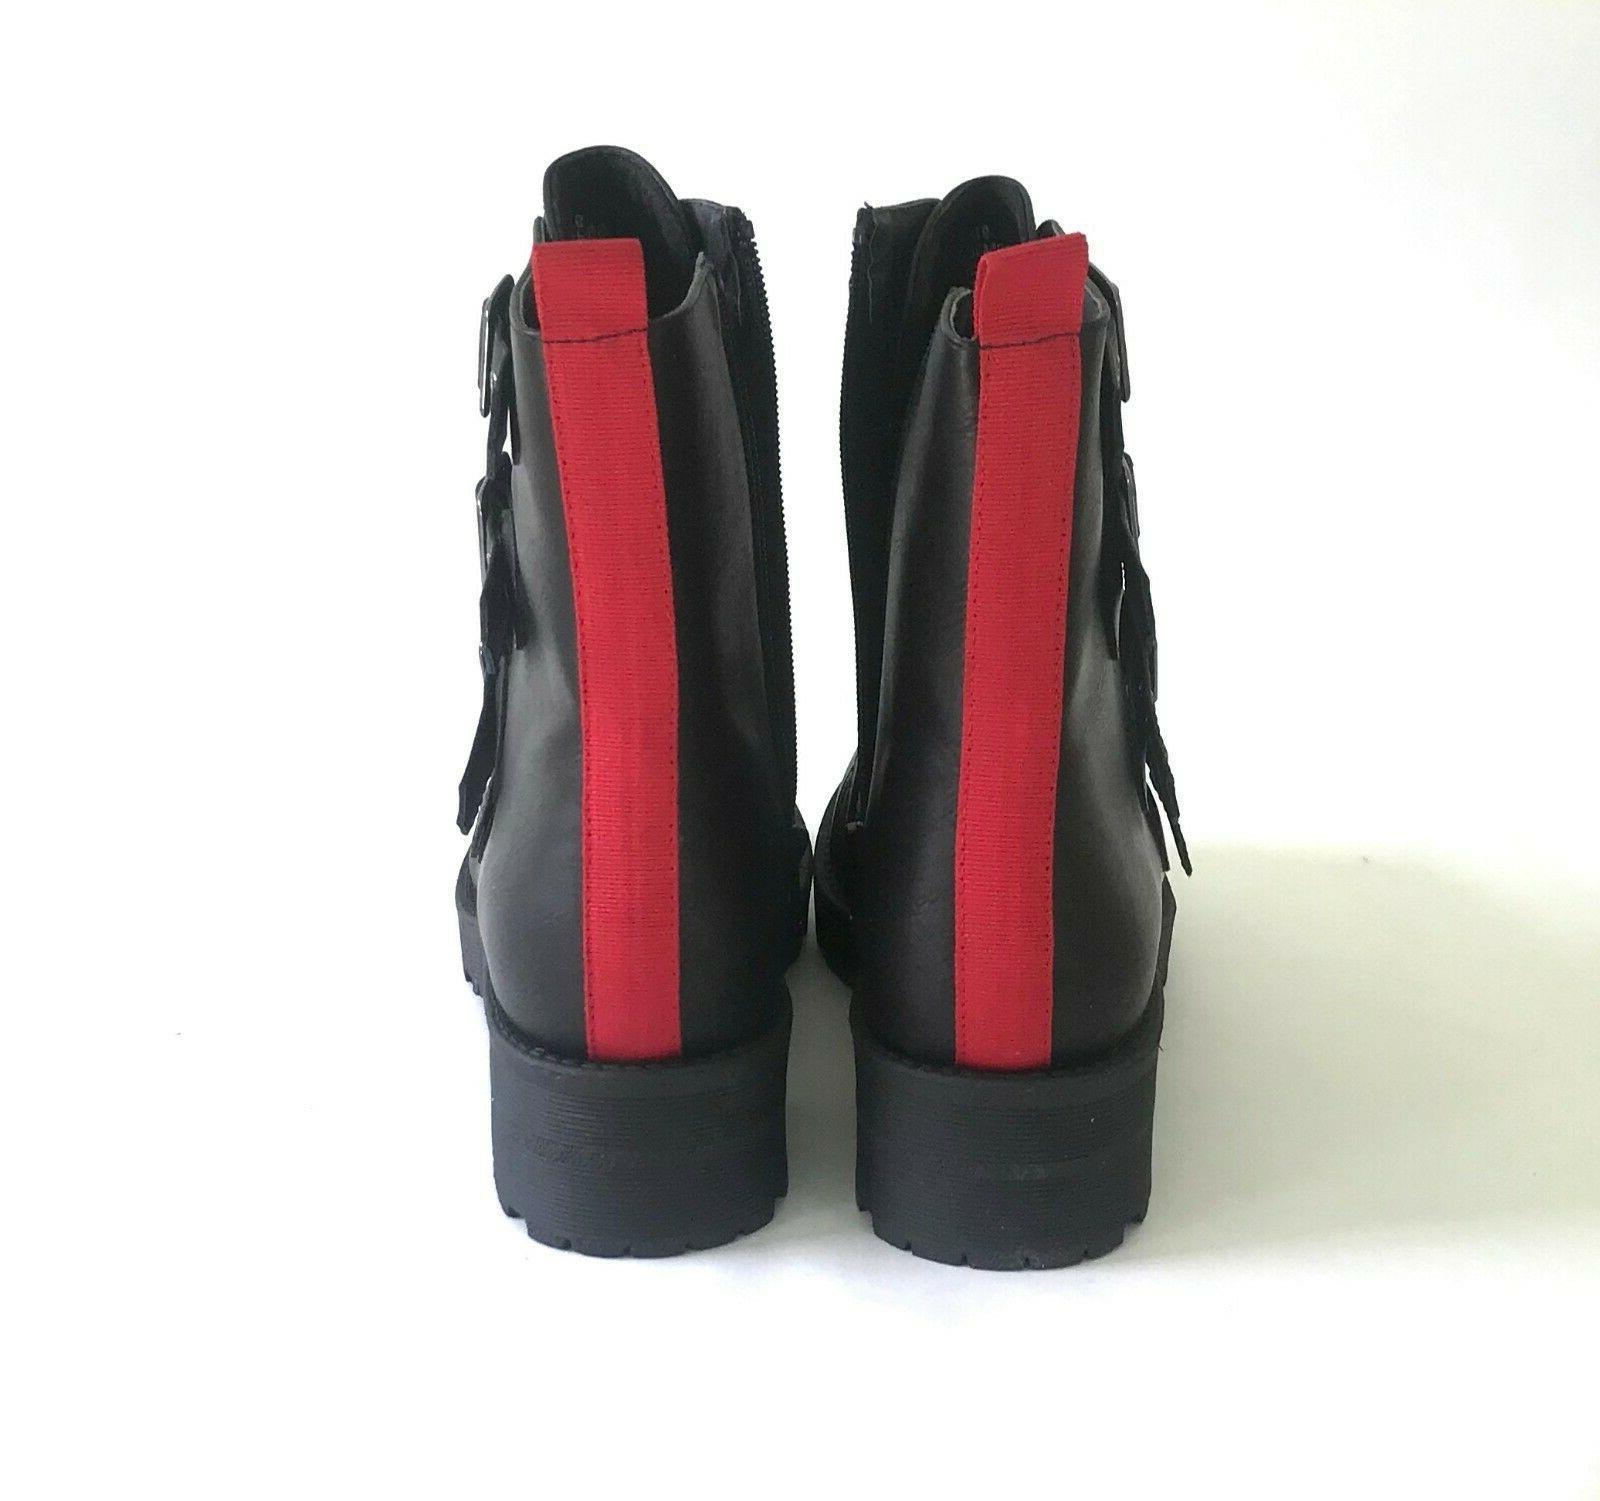 MIA Chelsey Women's Motorcycle Boots Black